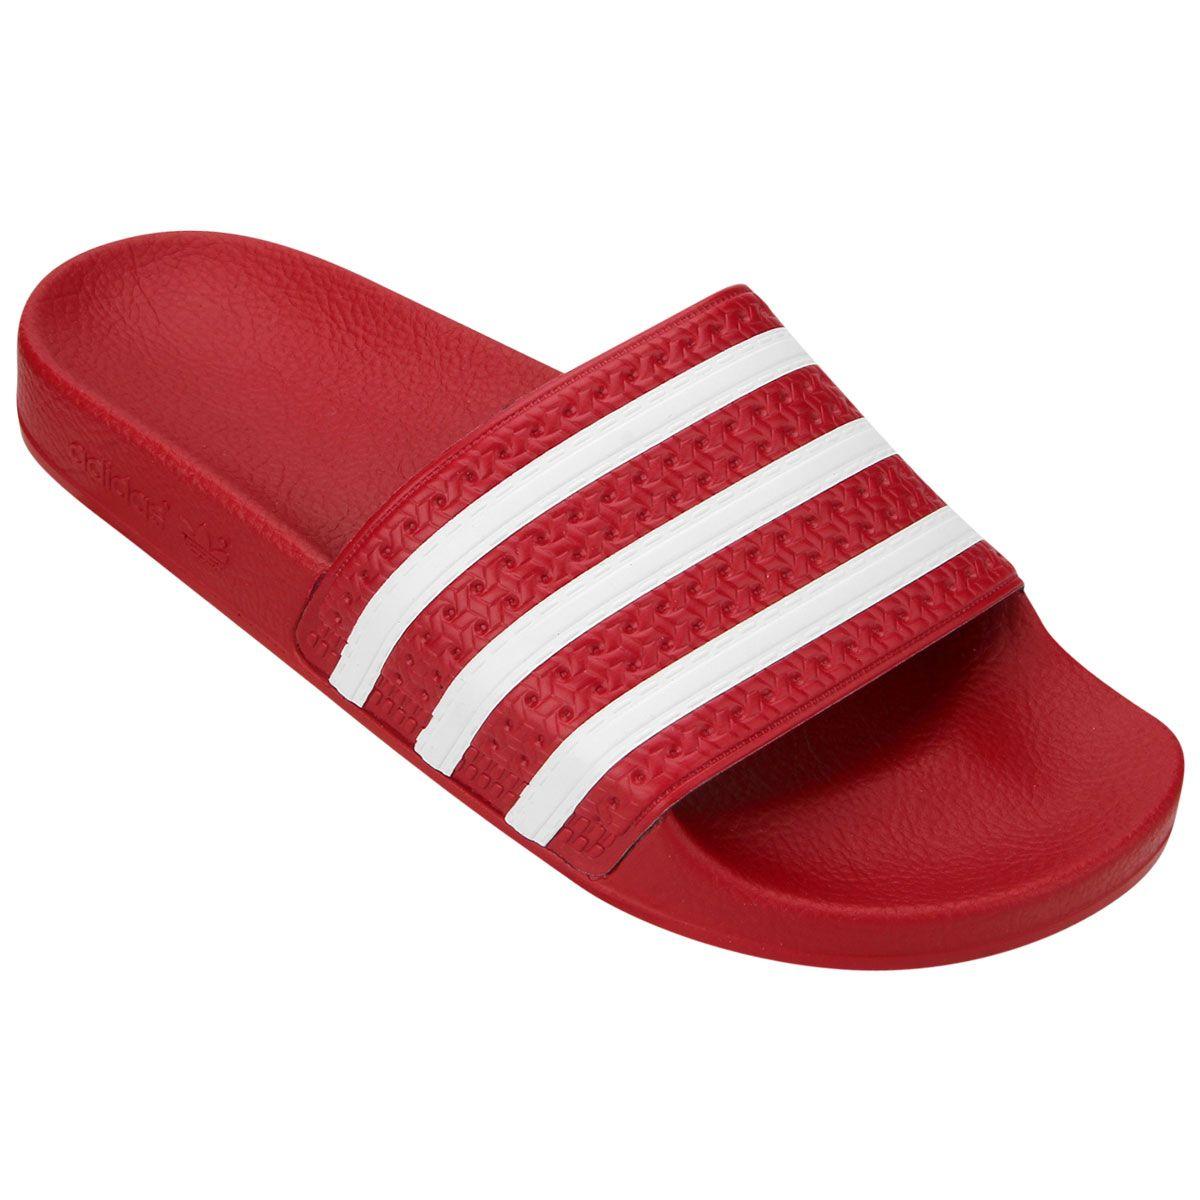 9e334ceaa5e Netshoes - Chinelo Adidas Adilette Mais